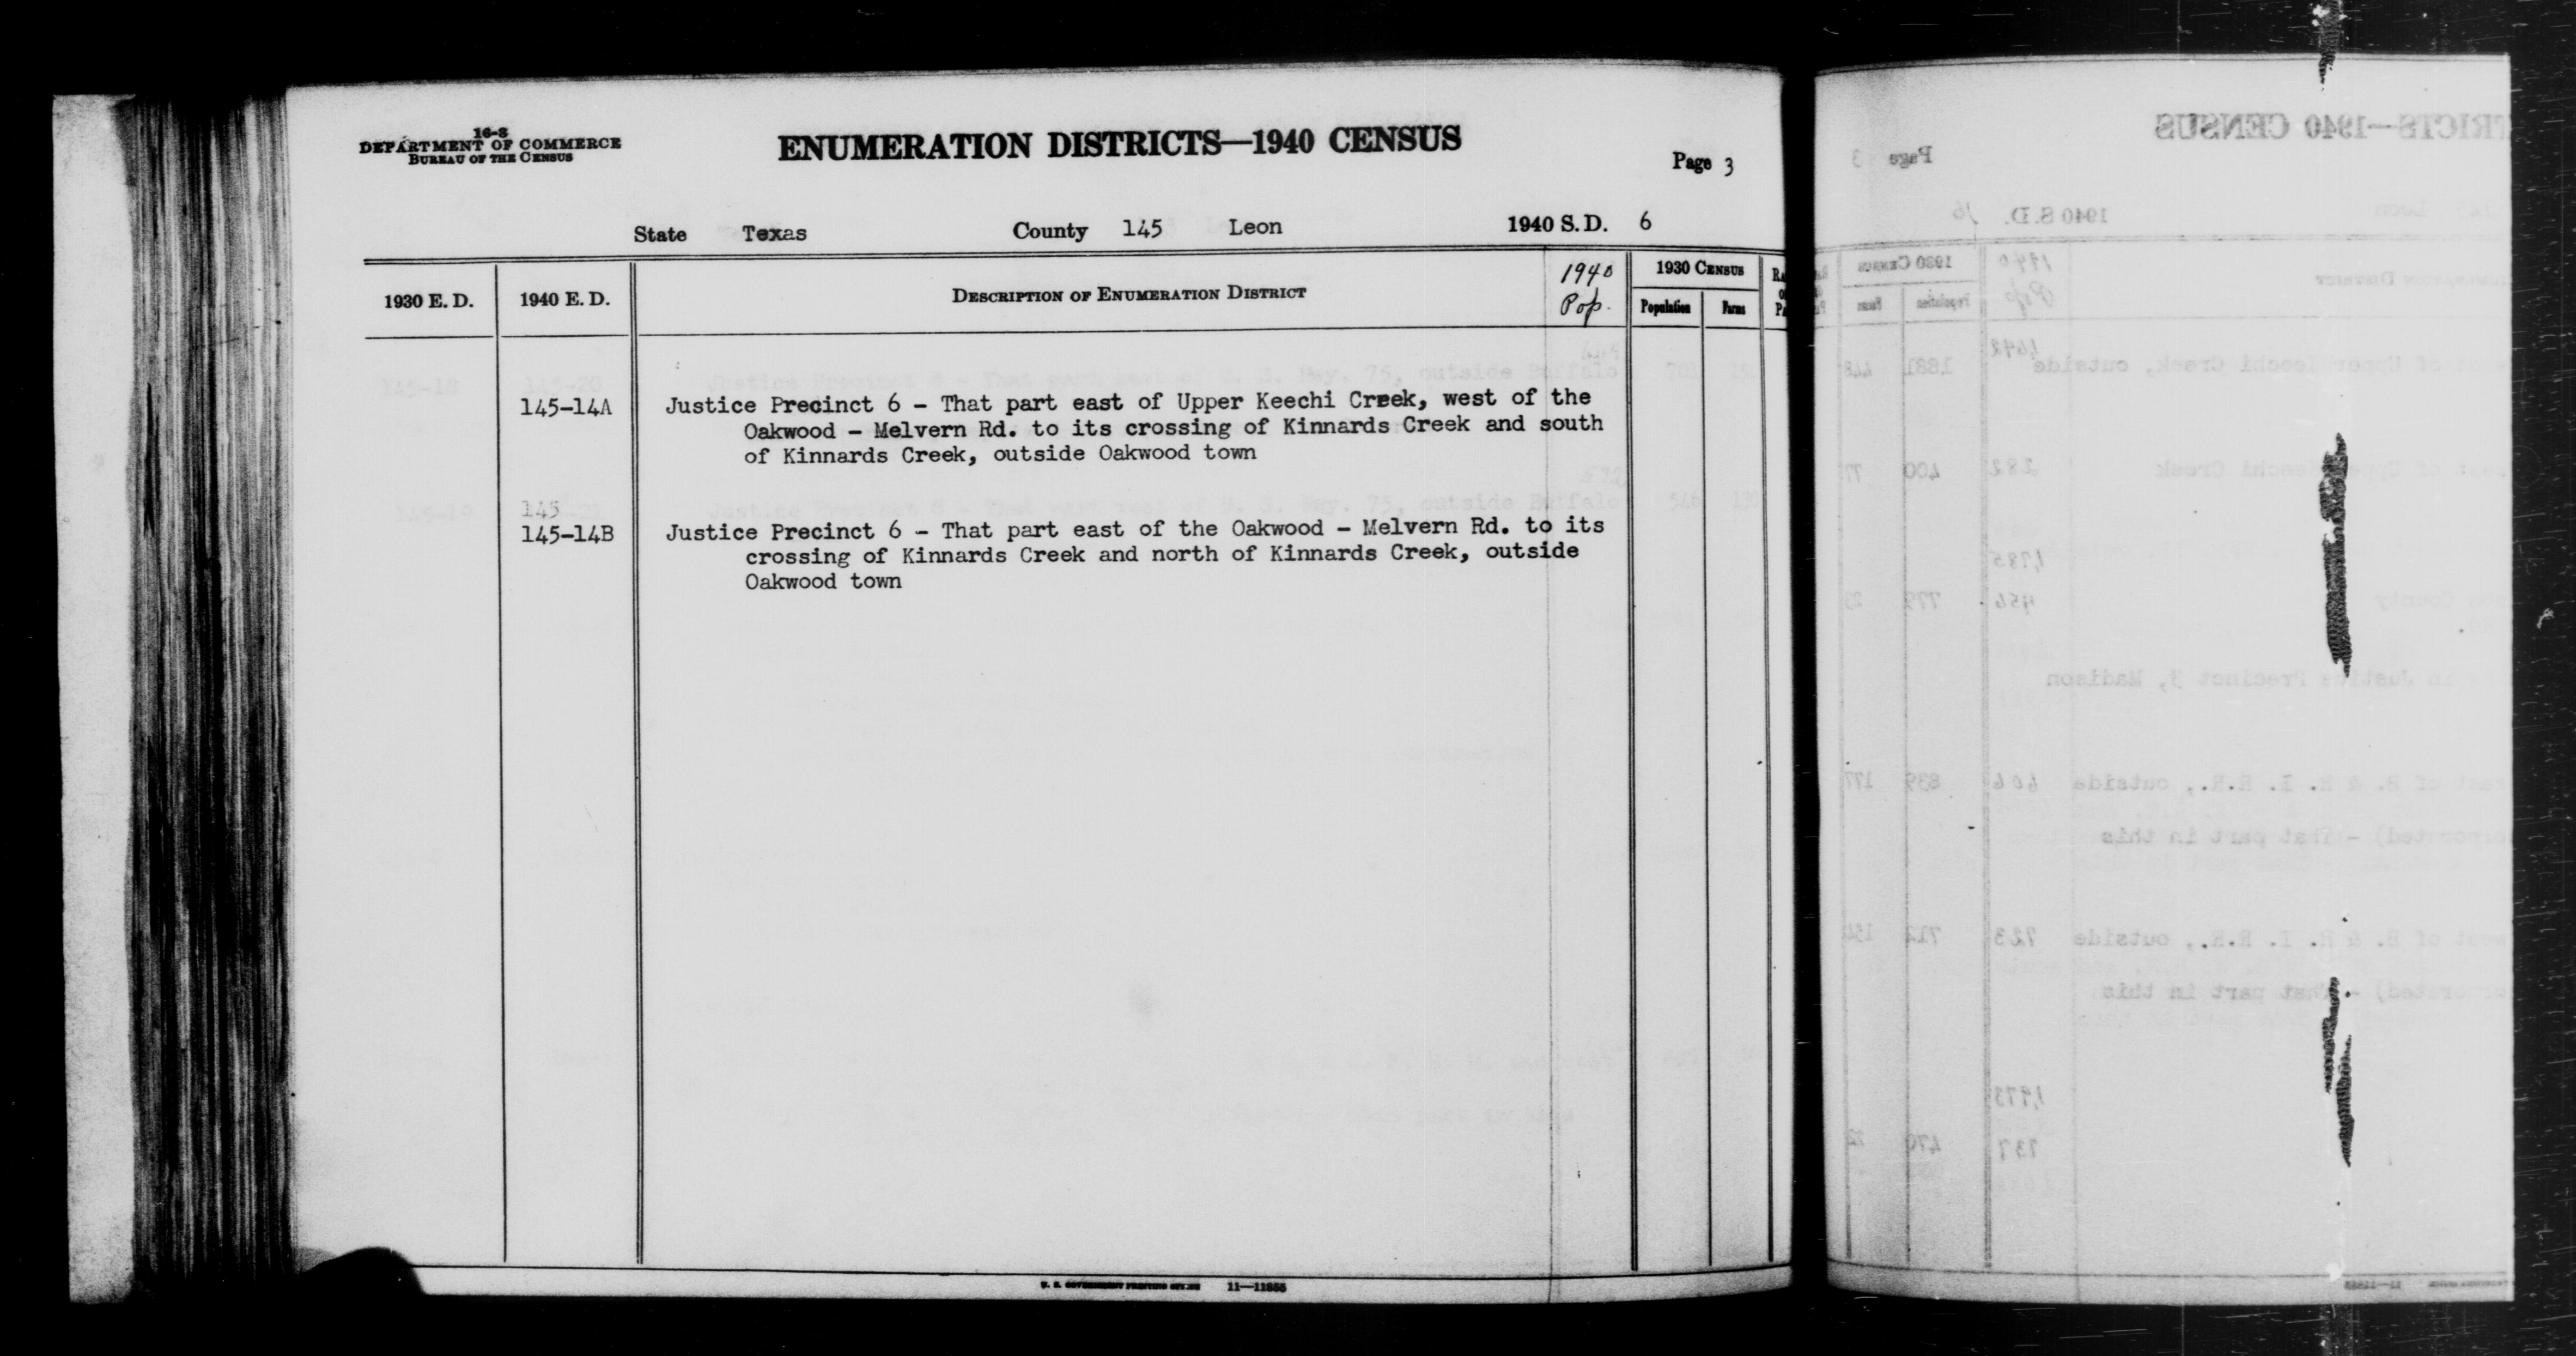 1940 Census Enumeration District Descriptions - Texas - Leon County - ED 145-14A, ED 145-14B